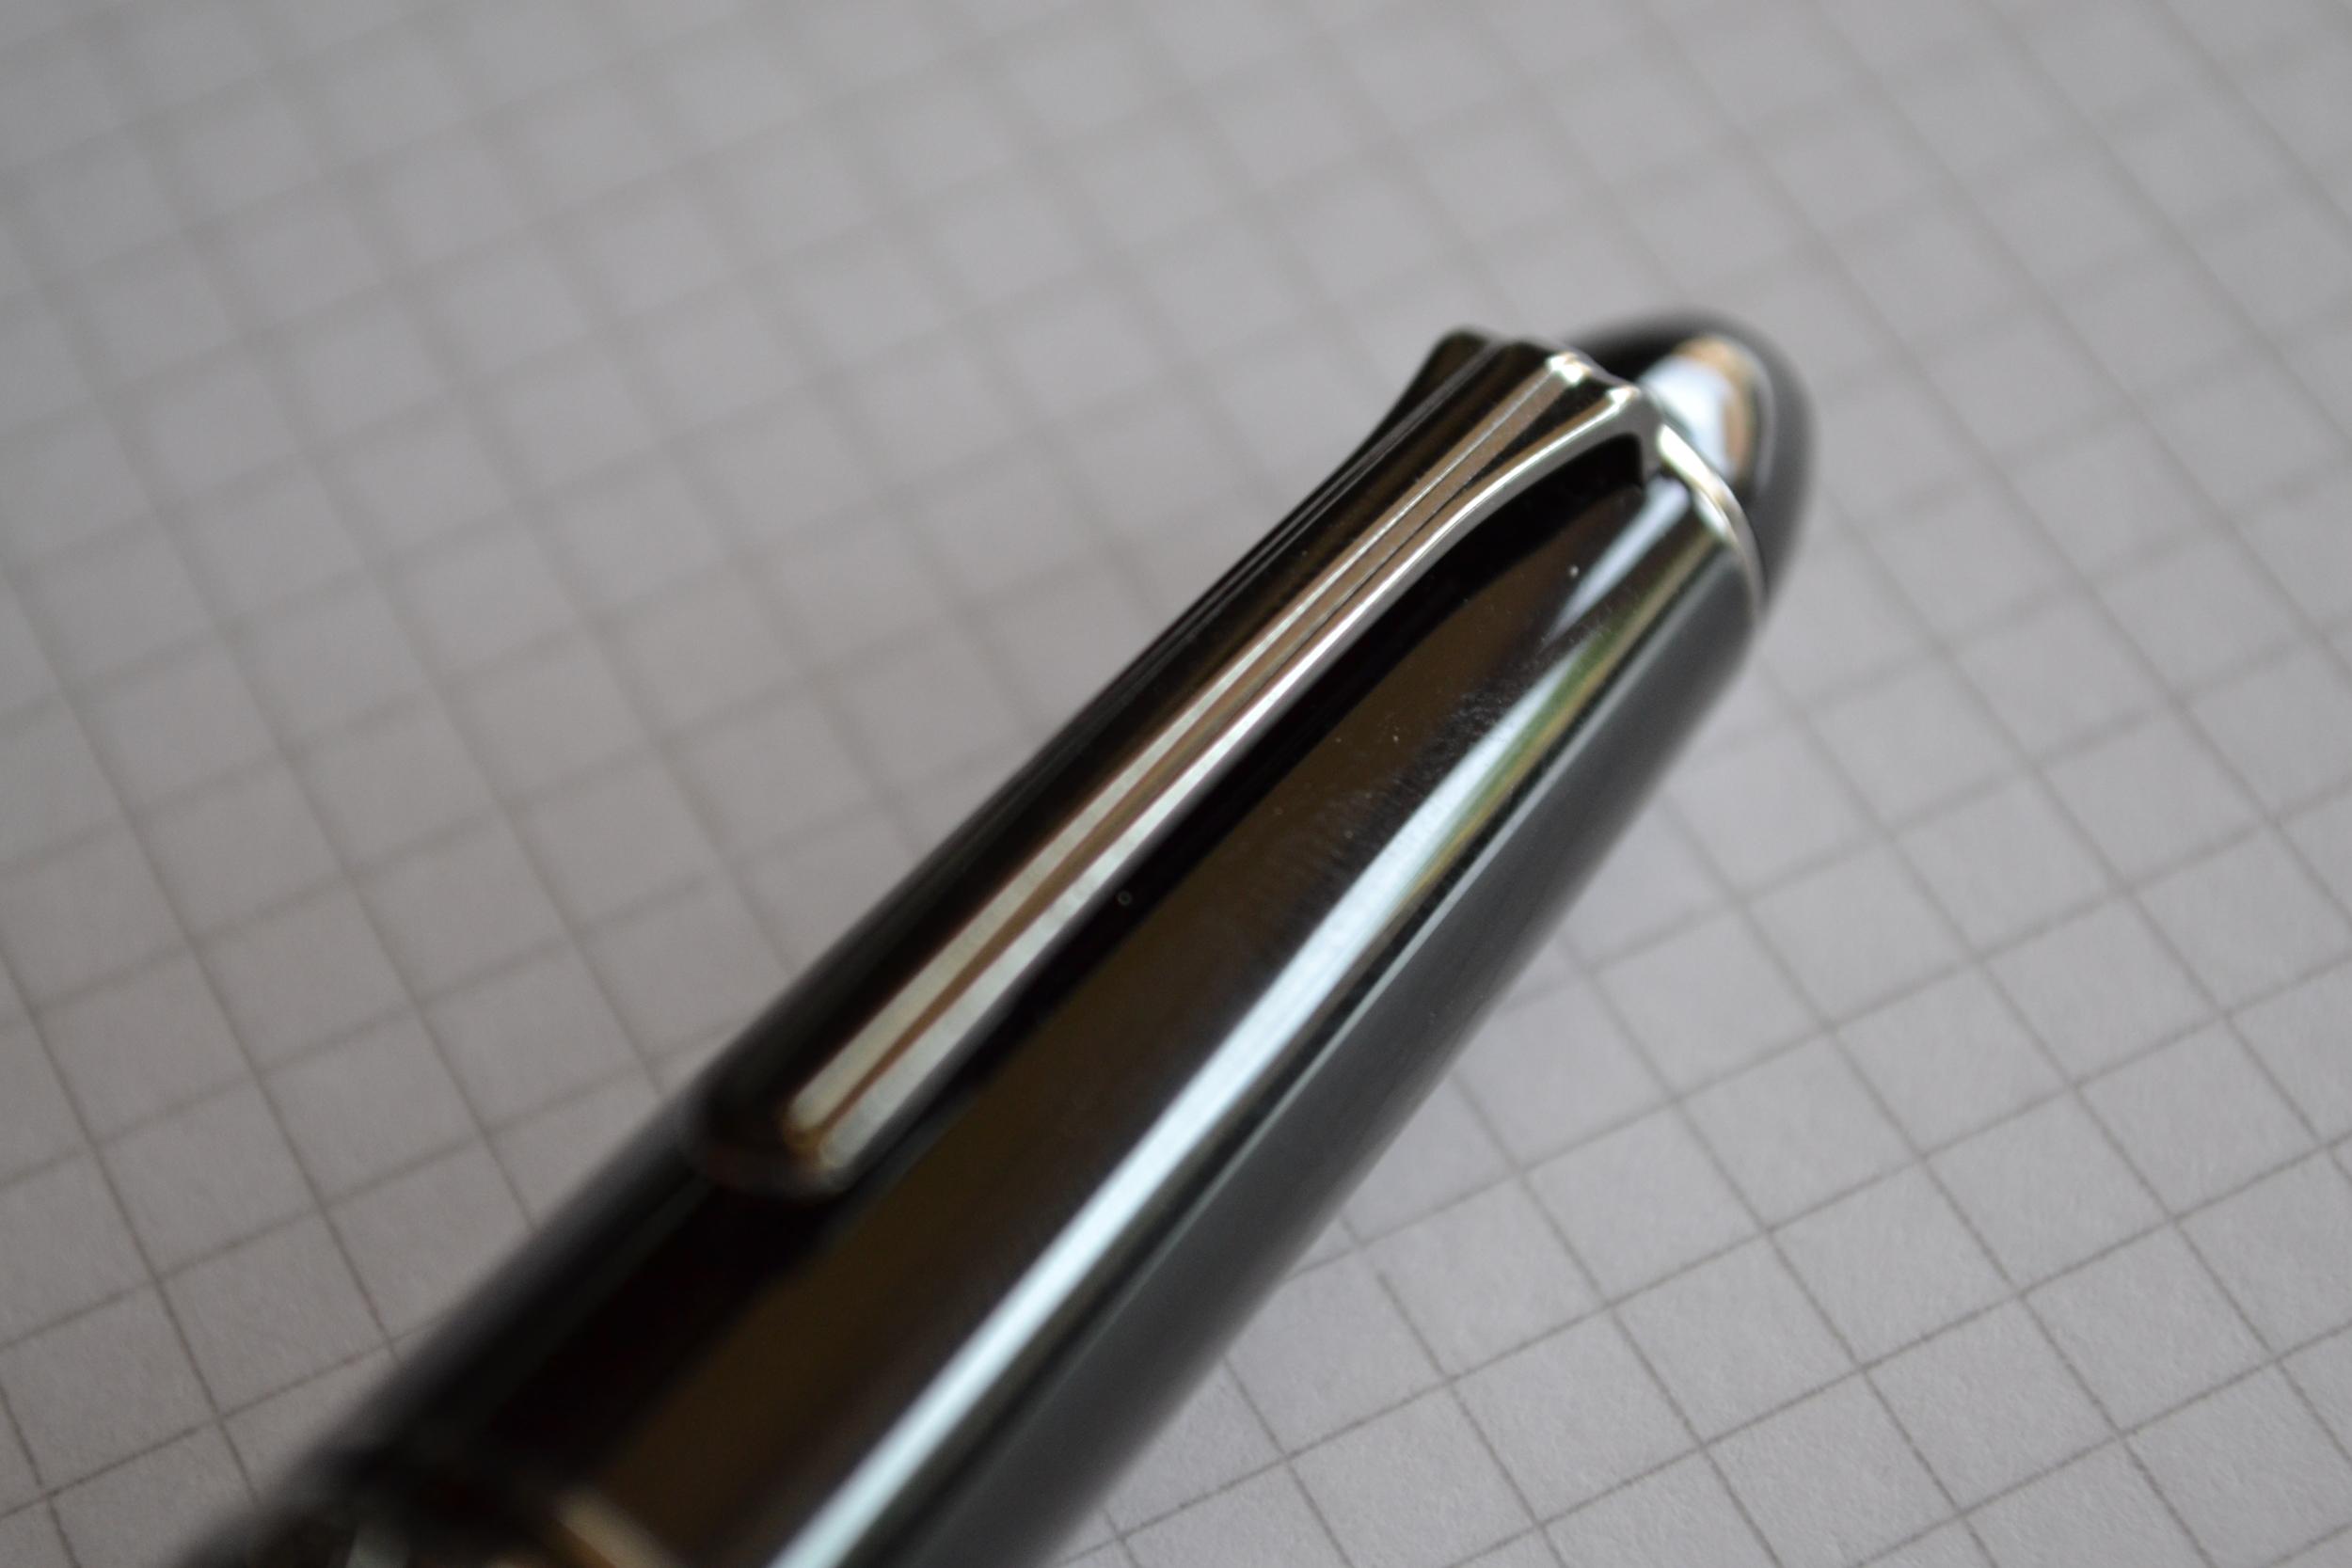 Sailor Black Luster Fountain Pen Review